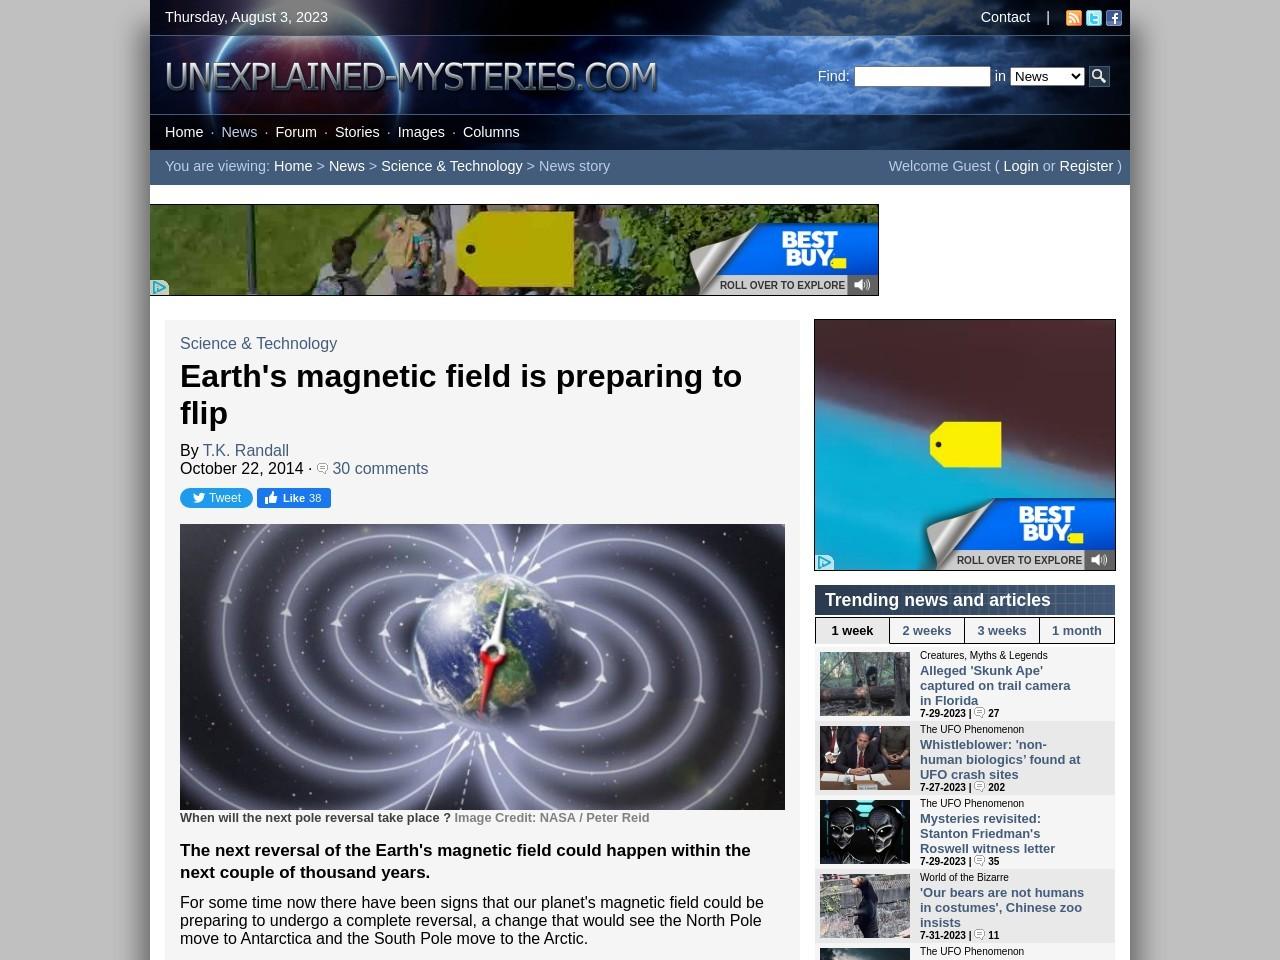 Earth's magnetic field is preparing to flip